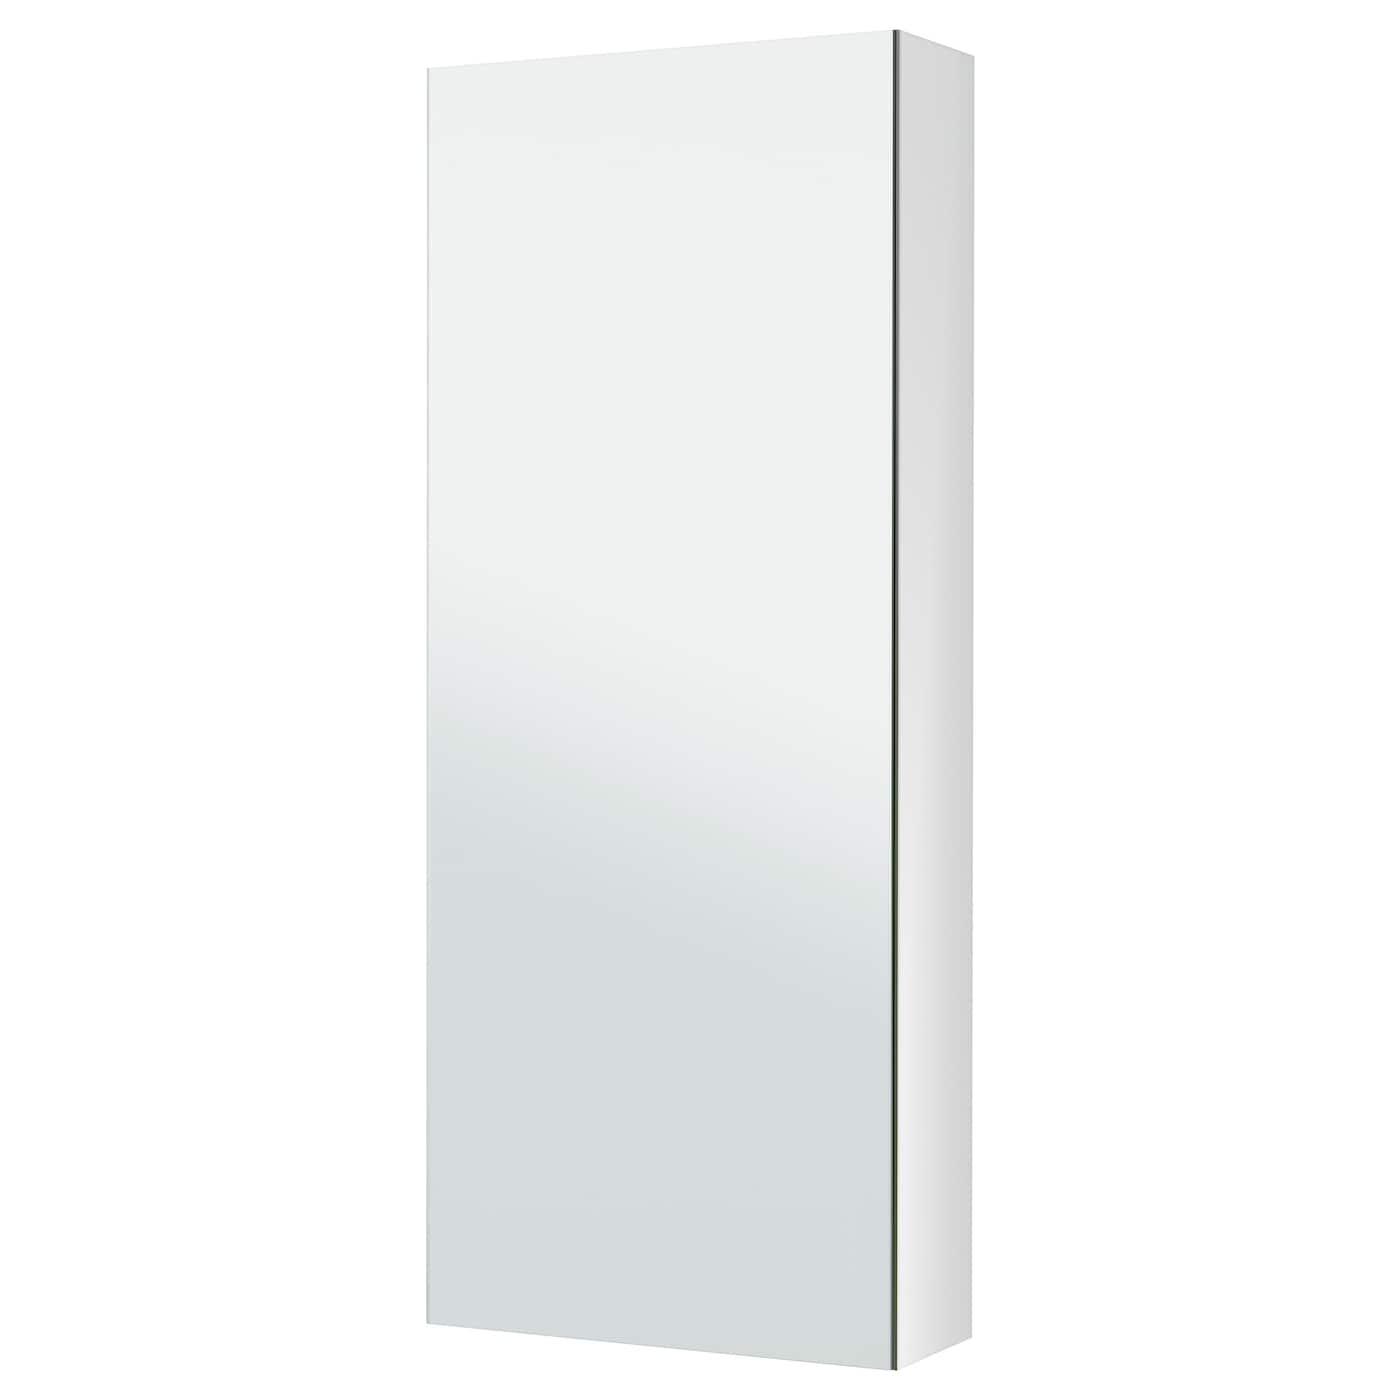 D Line Drawings Ikea : Godmorgon meuble à miroir porte cm ikea